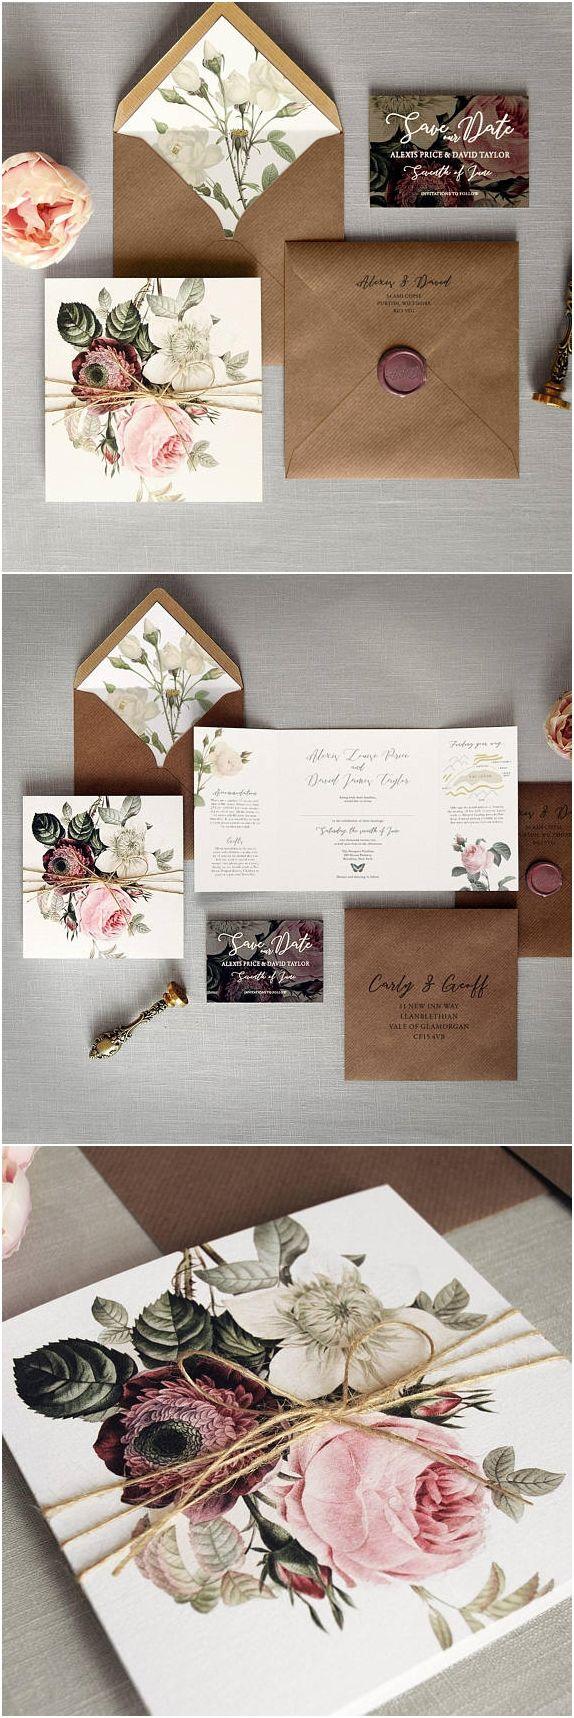 8441 best Wedding stationery images on Pinterest | Invitations ...